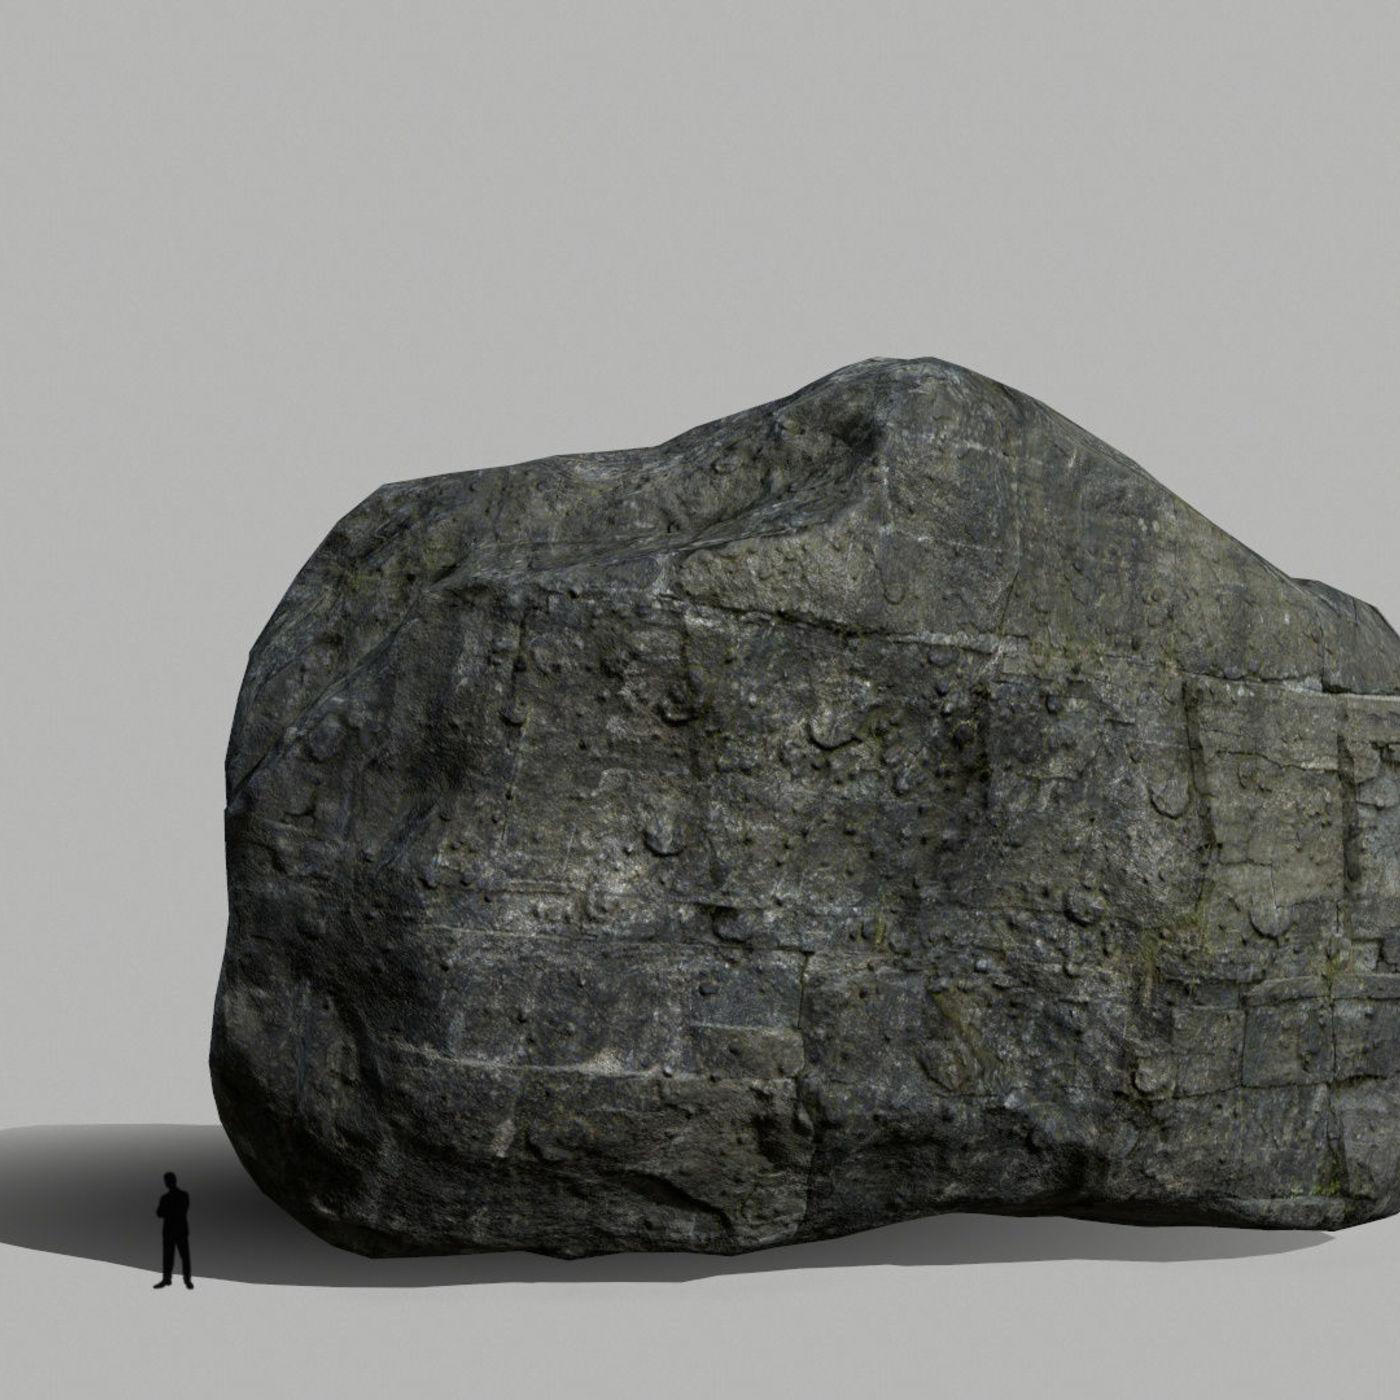 cliff rocks